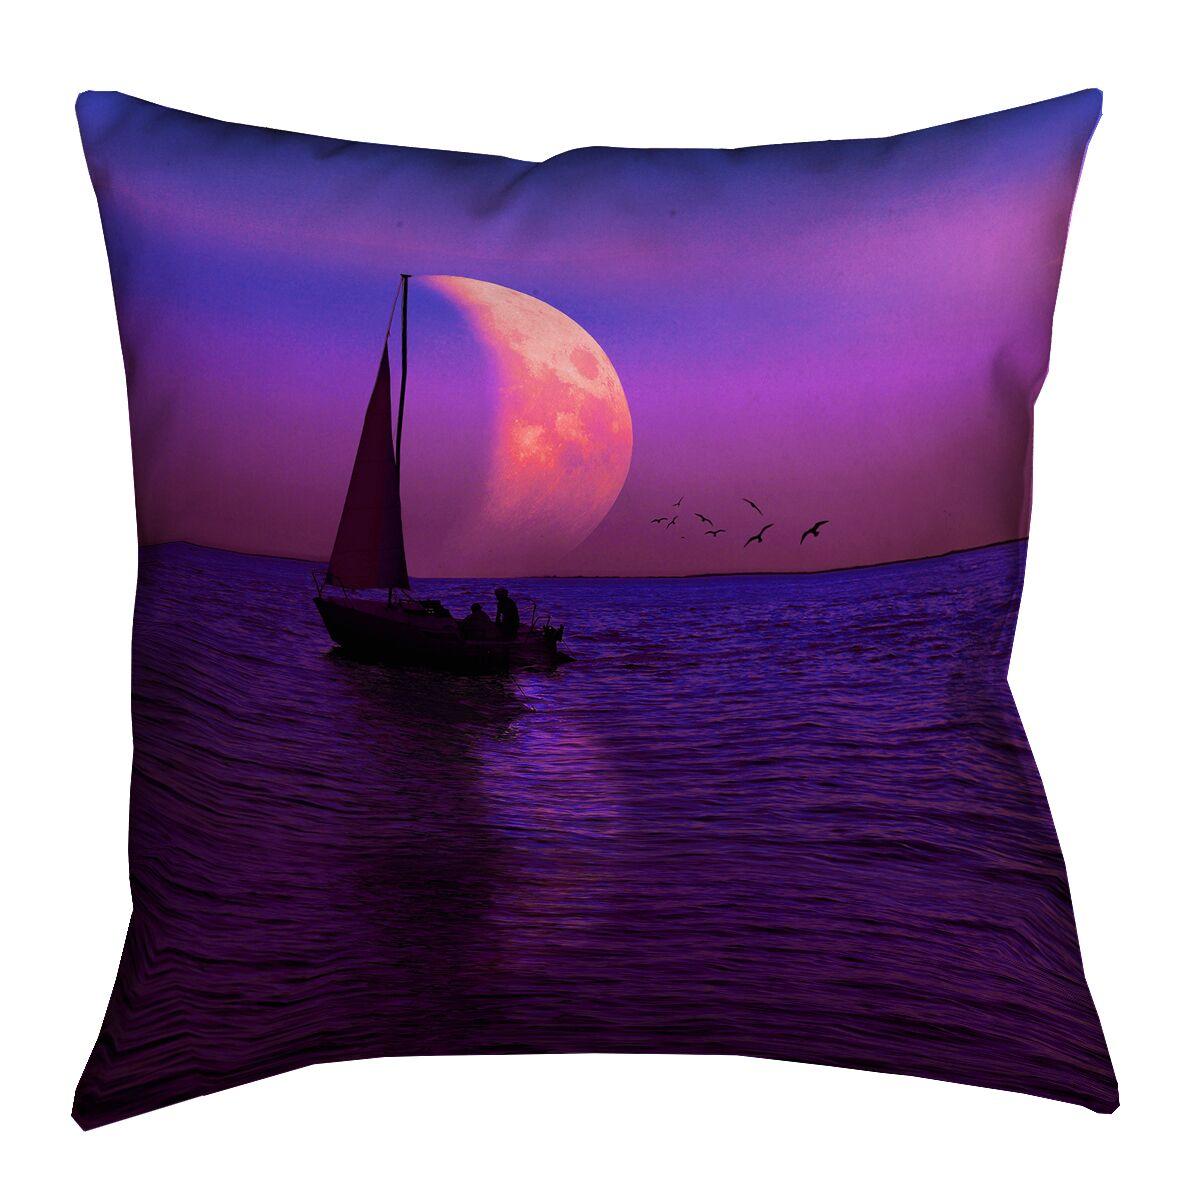 Jada Magenta Moon and Sailboat Suede Throw Pillow Size: 14